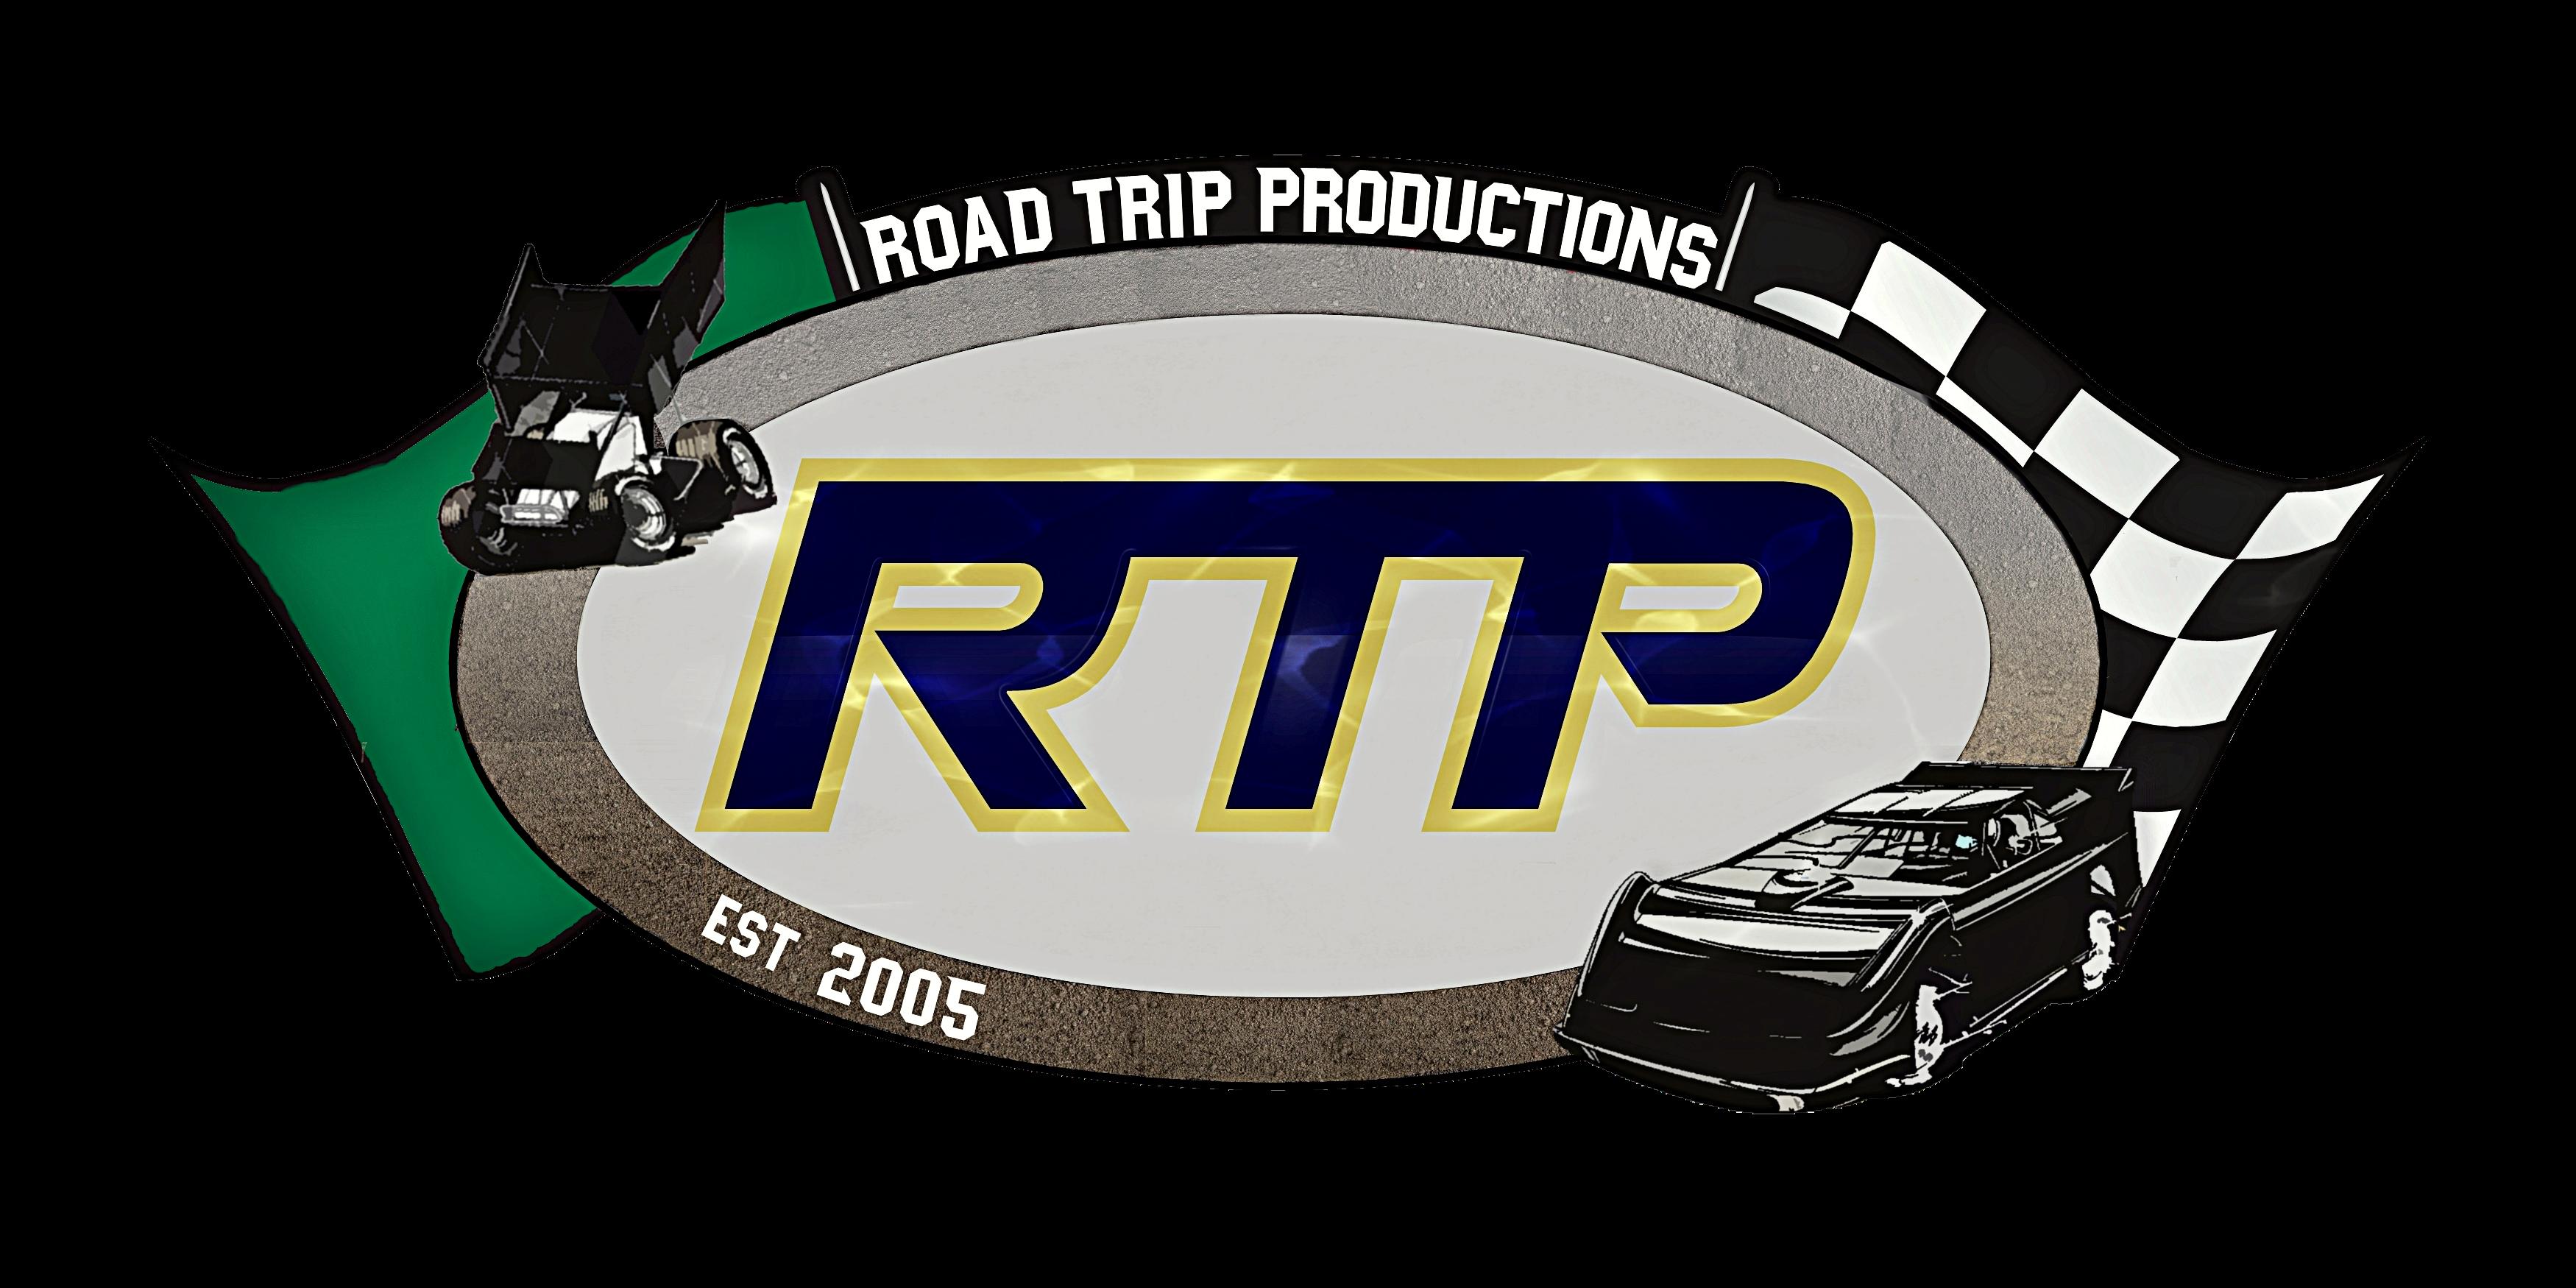 Multimedia road trip productions. Field clipart dirt field